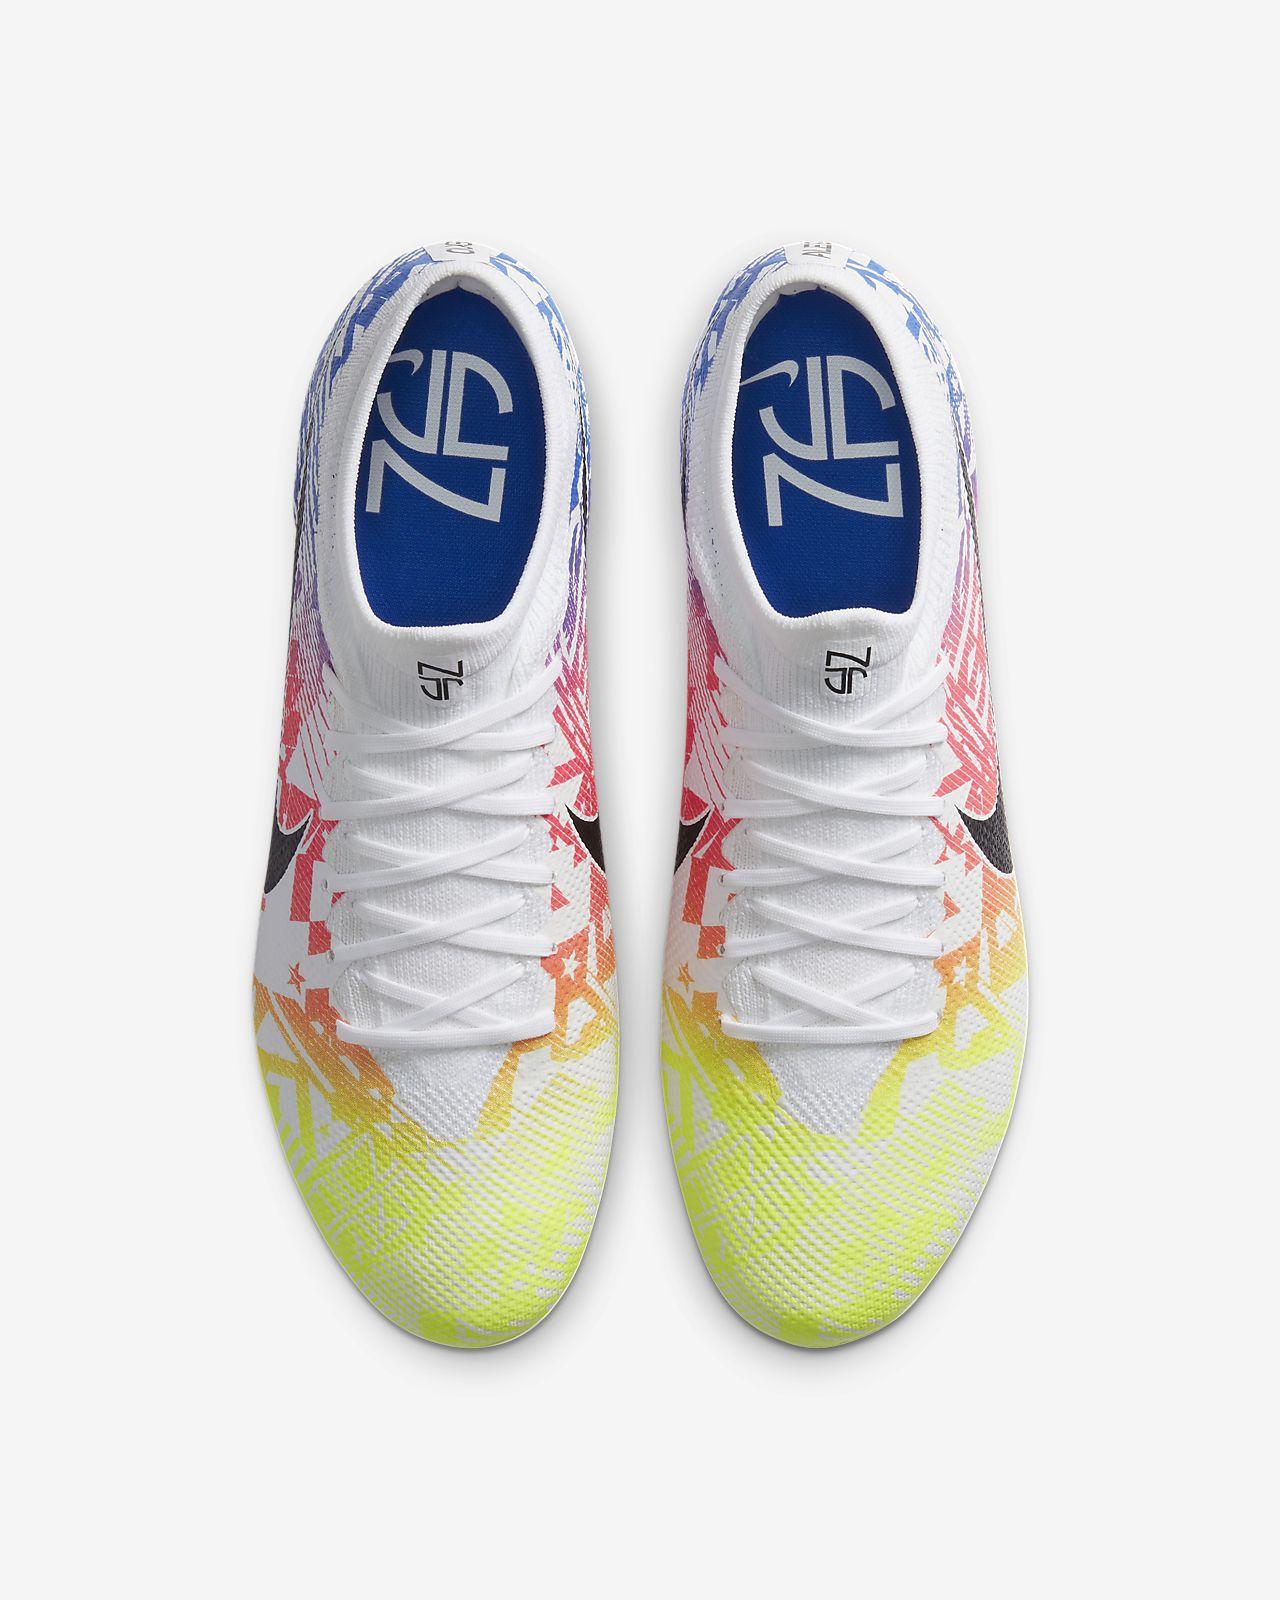 Nike Mercurial Vapor 13 Pro Neymar Jr. AG PRO Voetbalschoen (kunstgras)